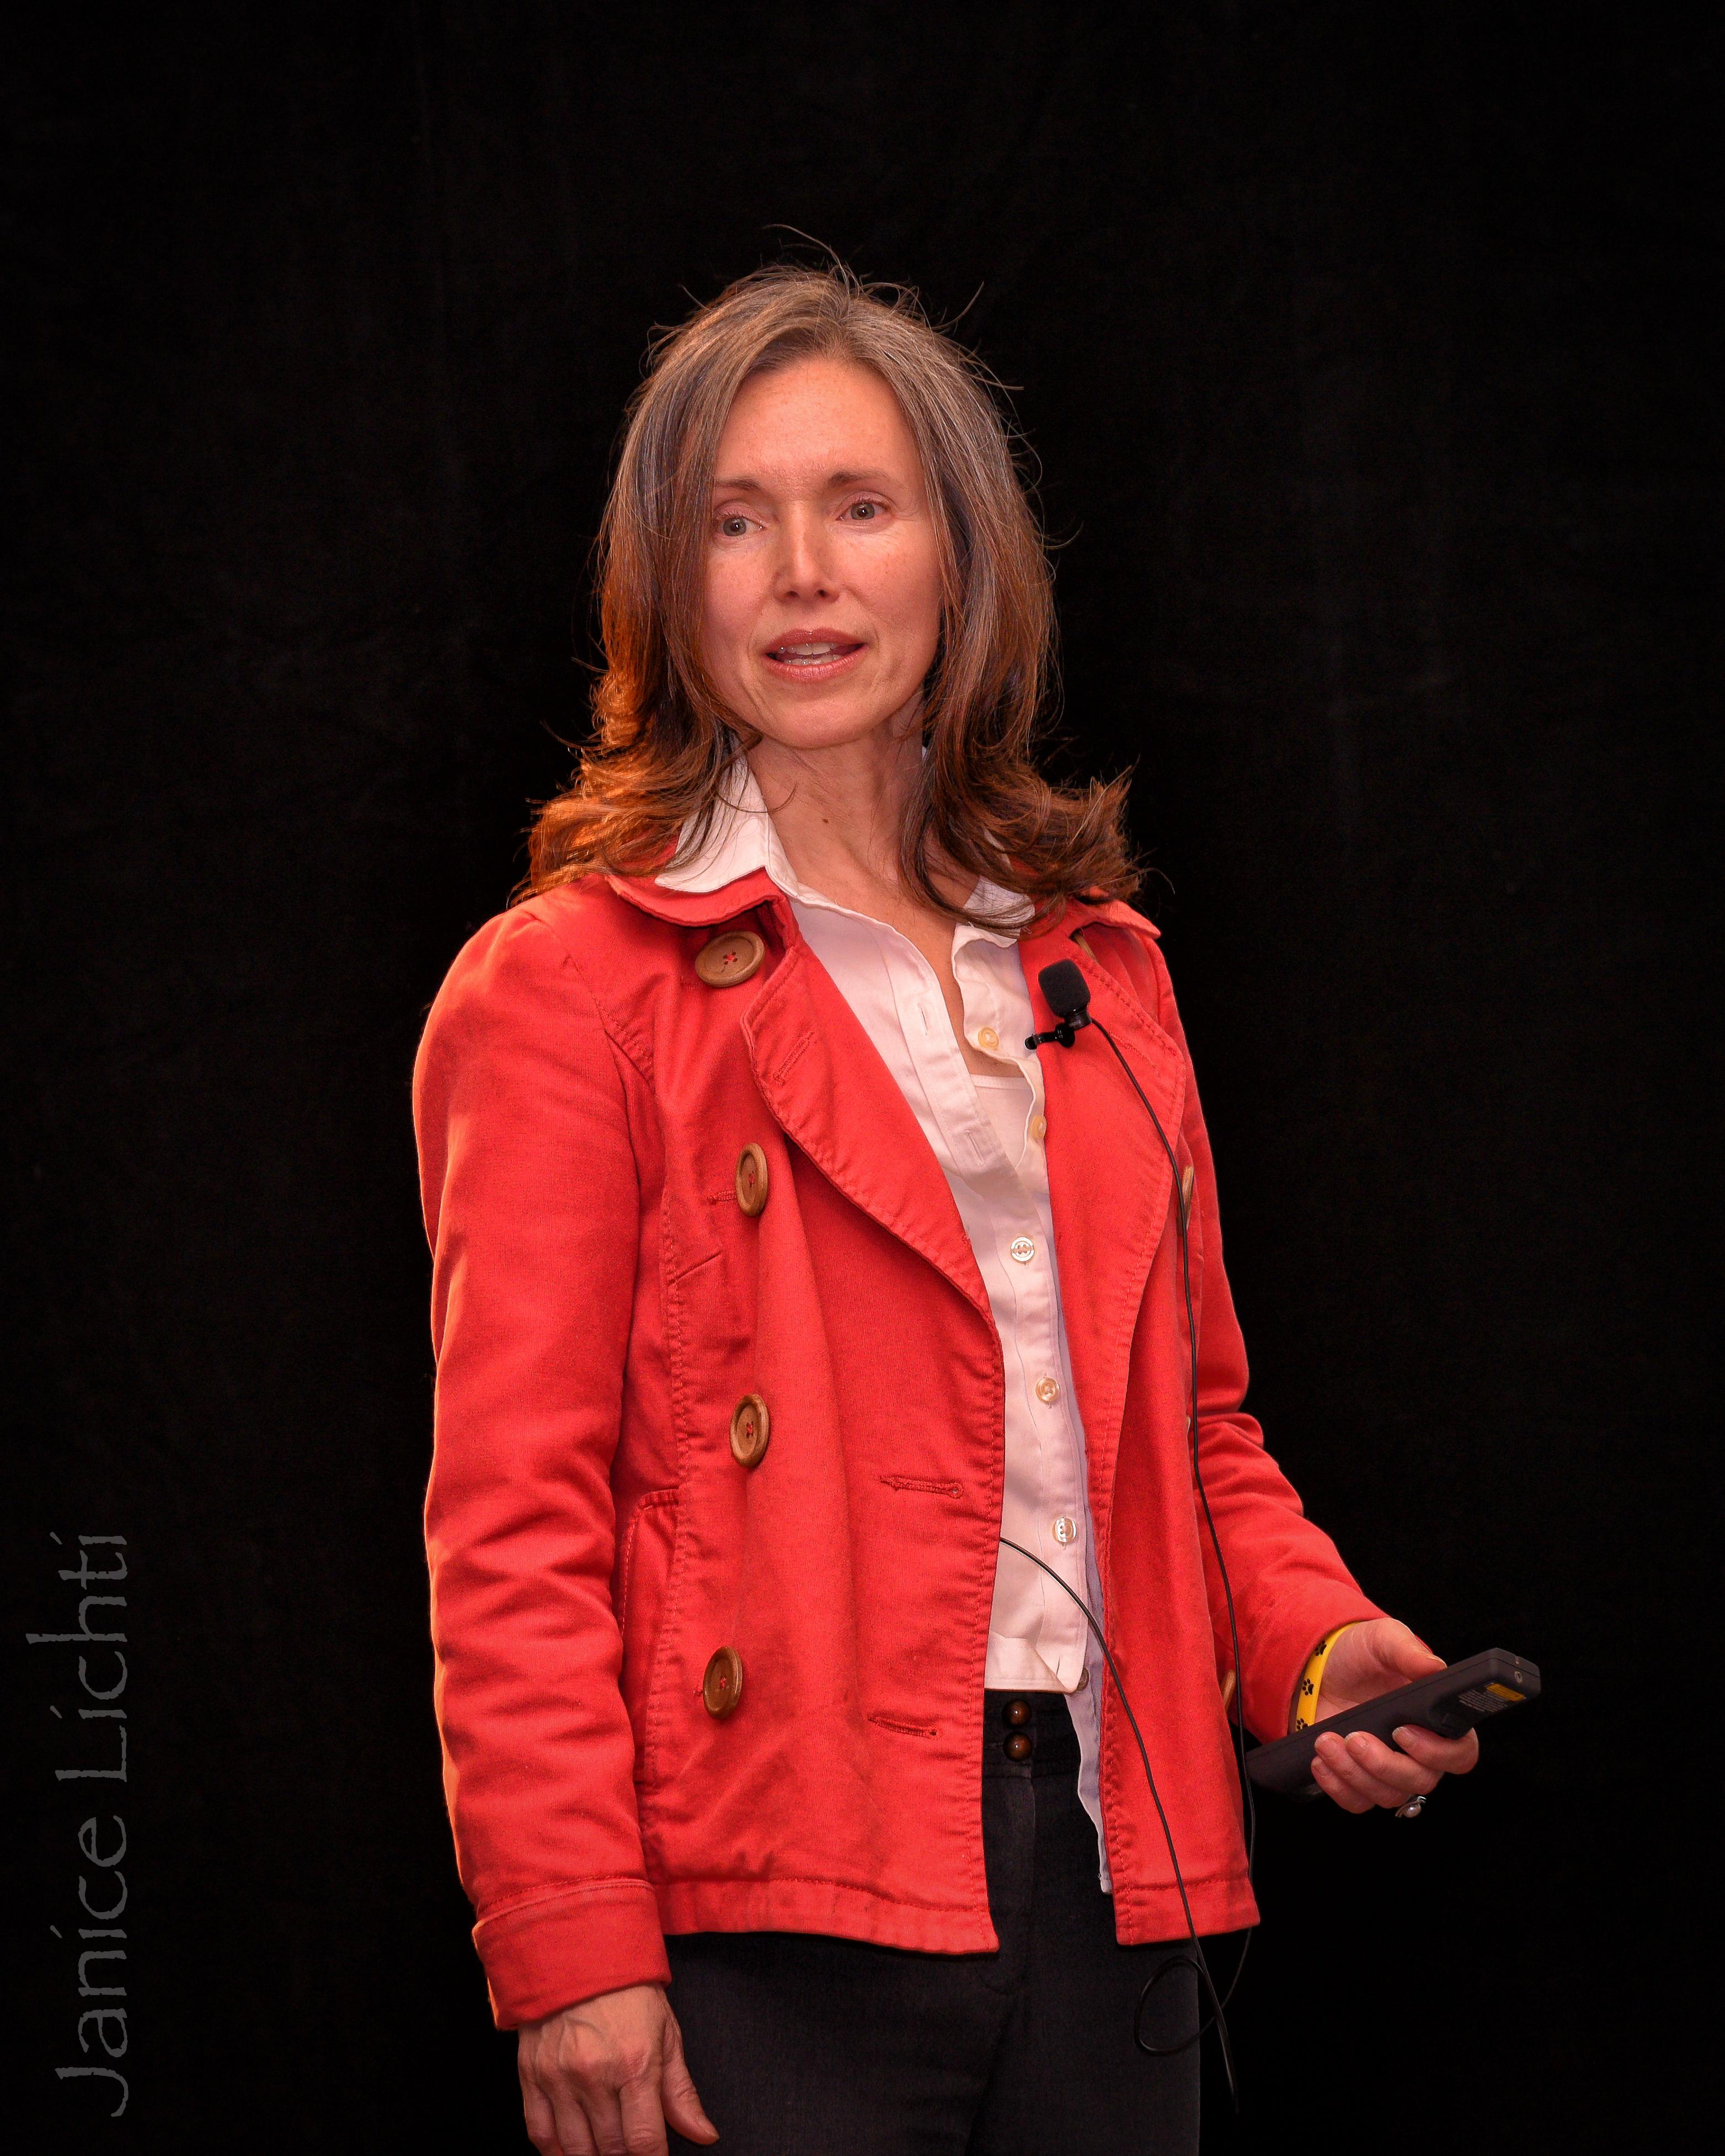 Cheryl Millett Janice Lichti Mammalian Omega Presentation SWIS Symposium 2015